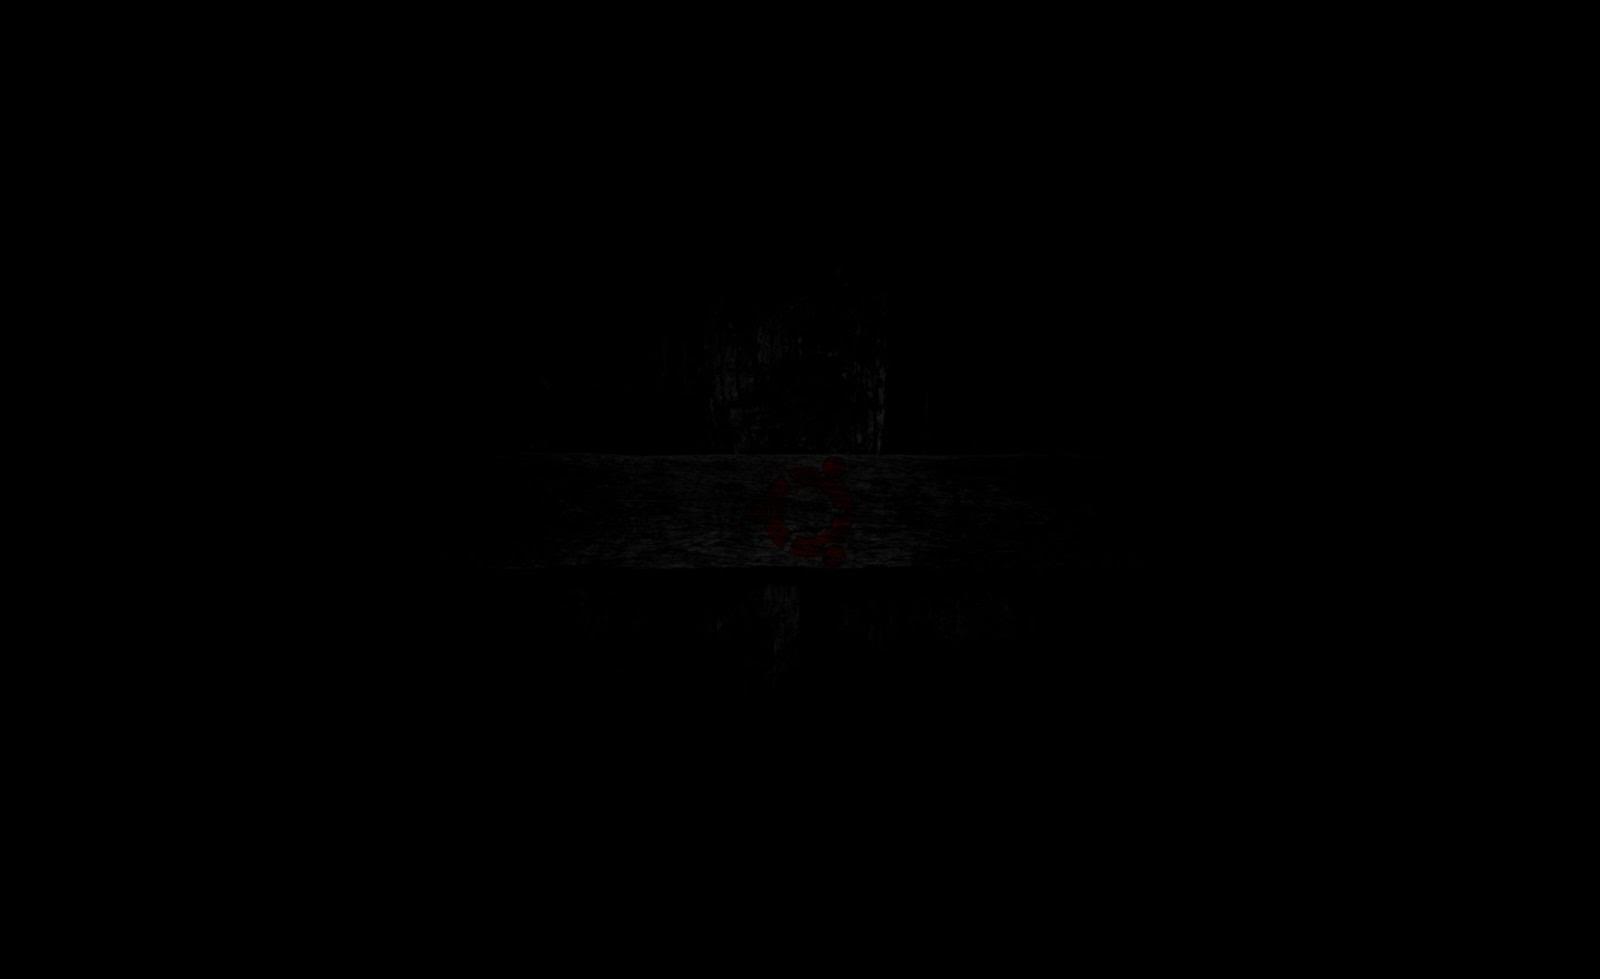 Ubuntu Dark Wallpaper Posted By John Peltier